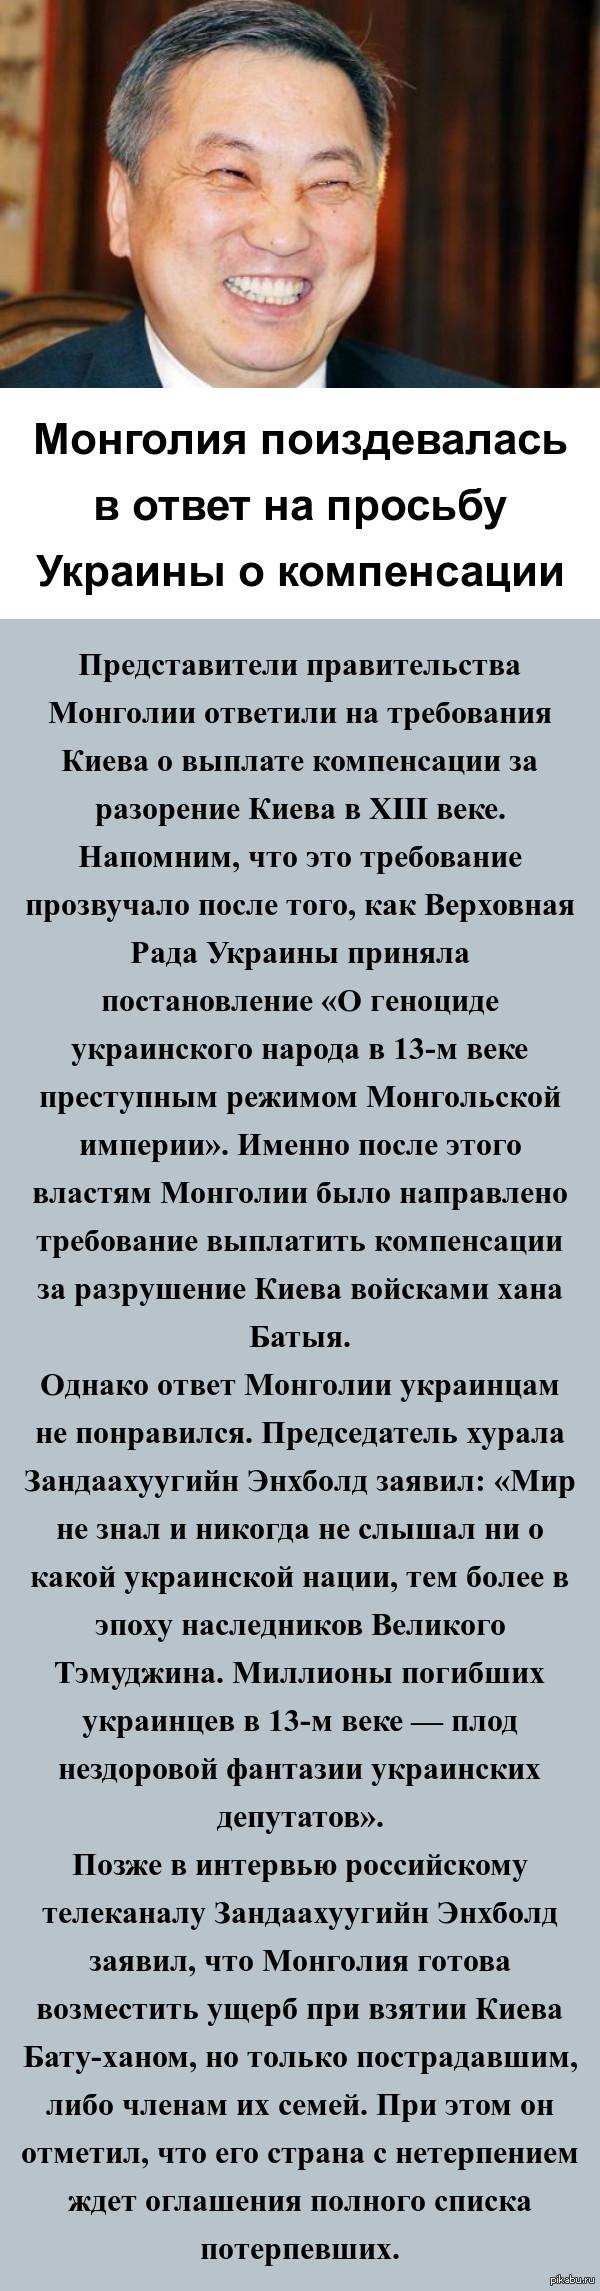 Монголия возместит ущерб Украине :D http://wow-impulse.net/news/30138-mongoliya-poizdevalas-v-otvet-na-prosbu-ukrainy-o-kompensacii.html